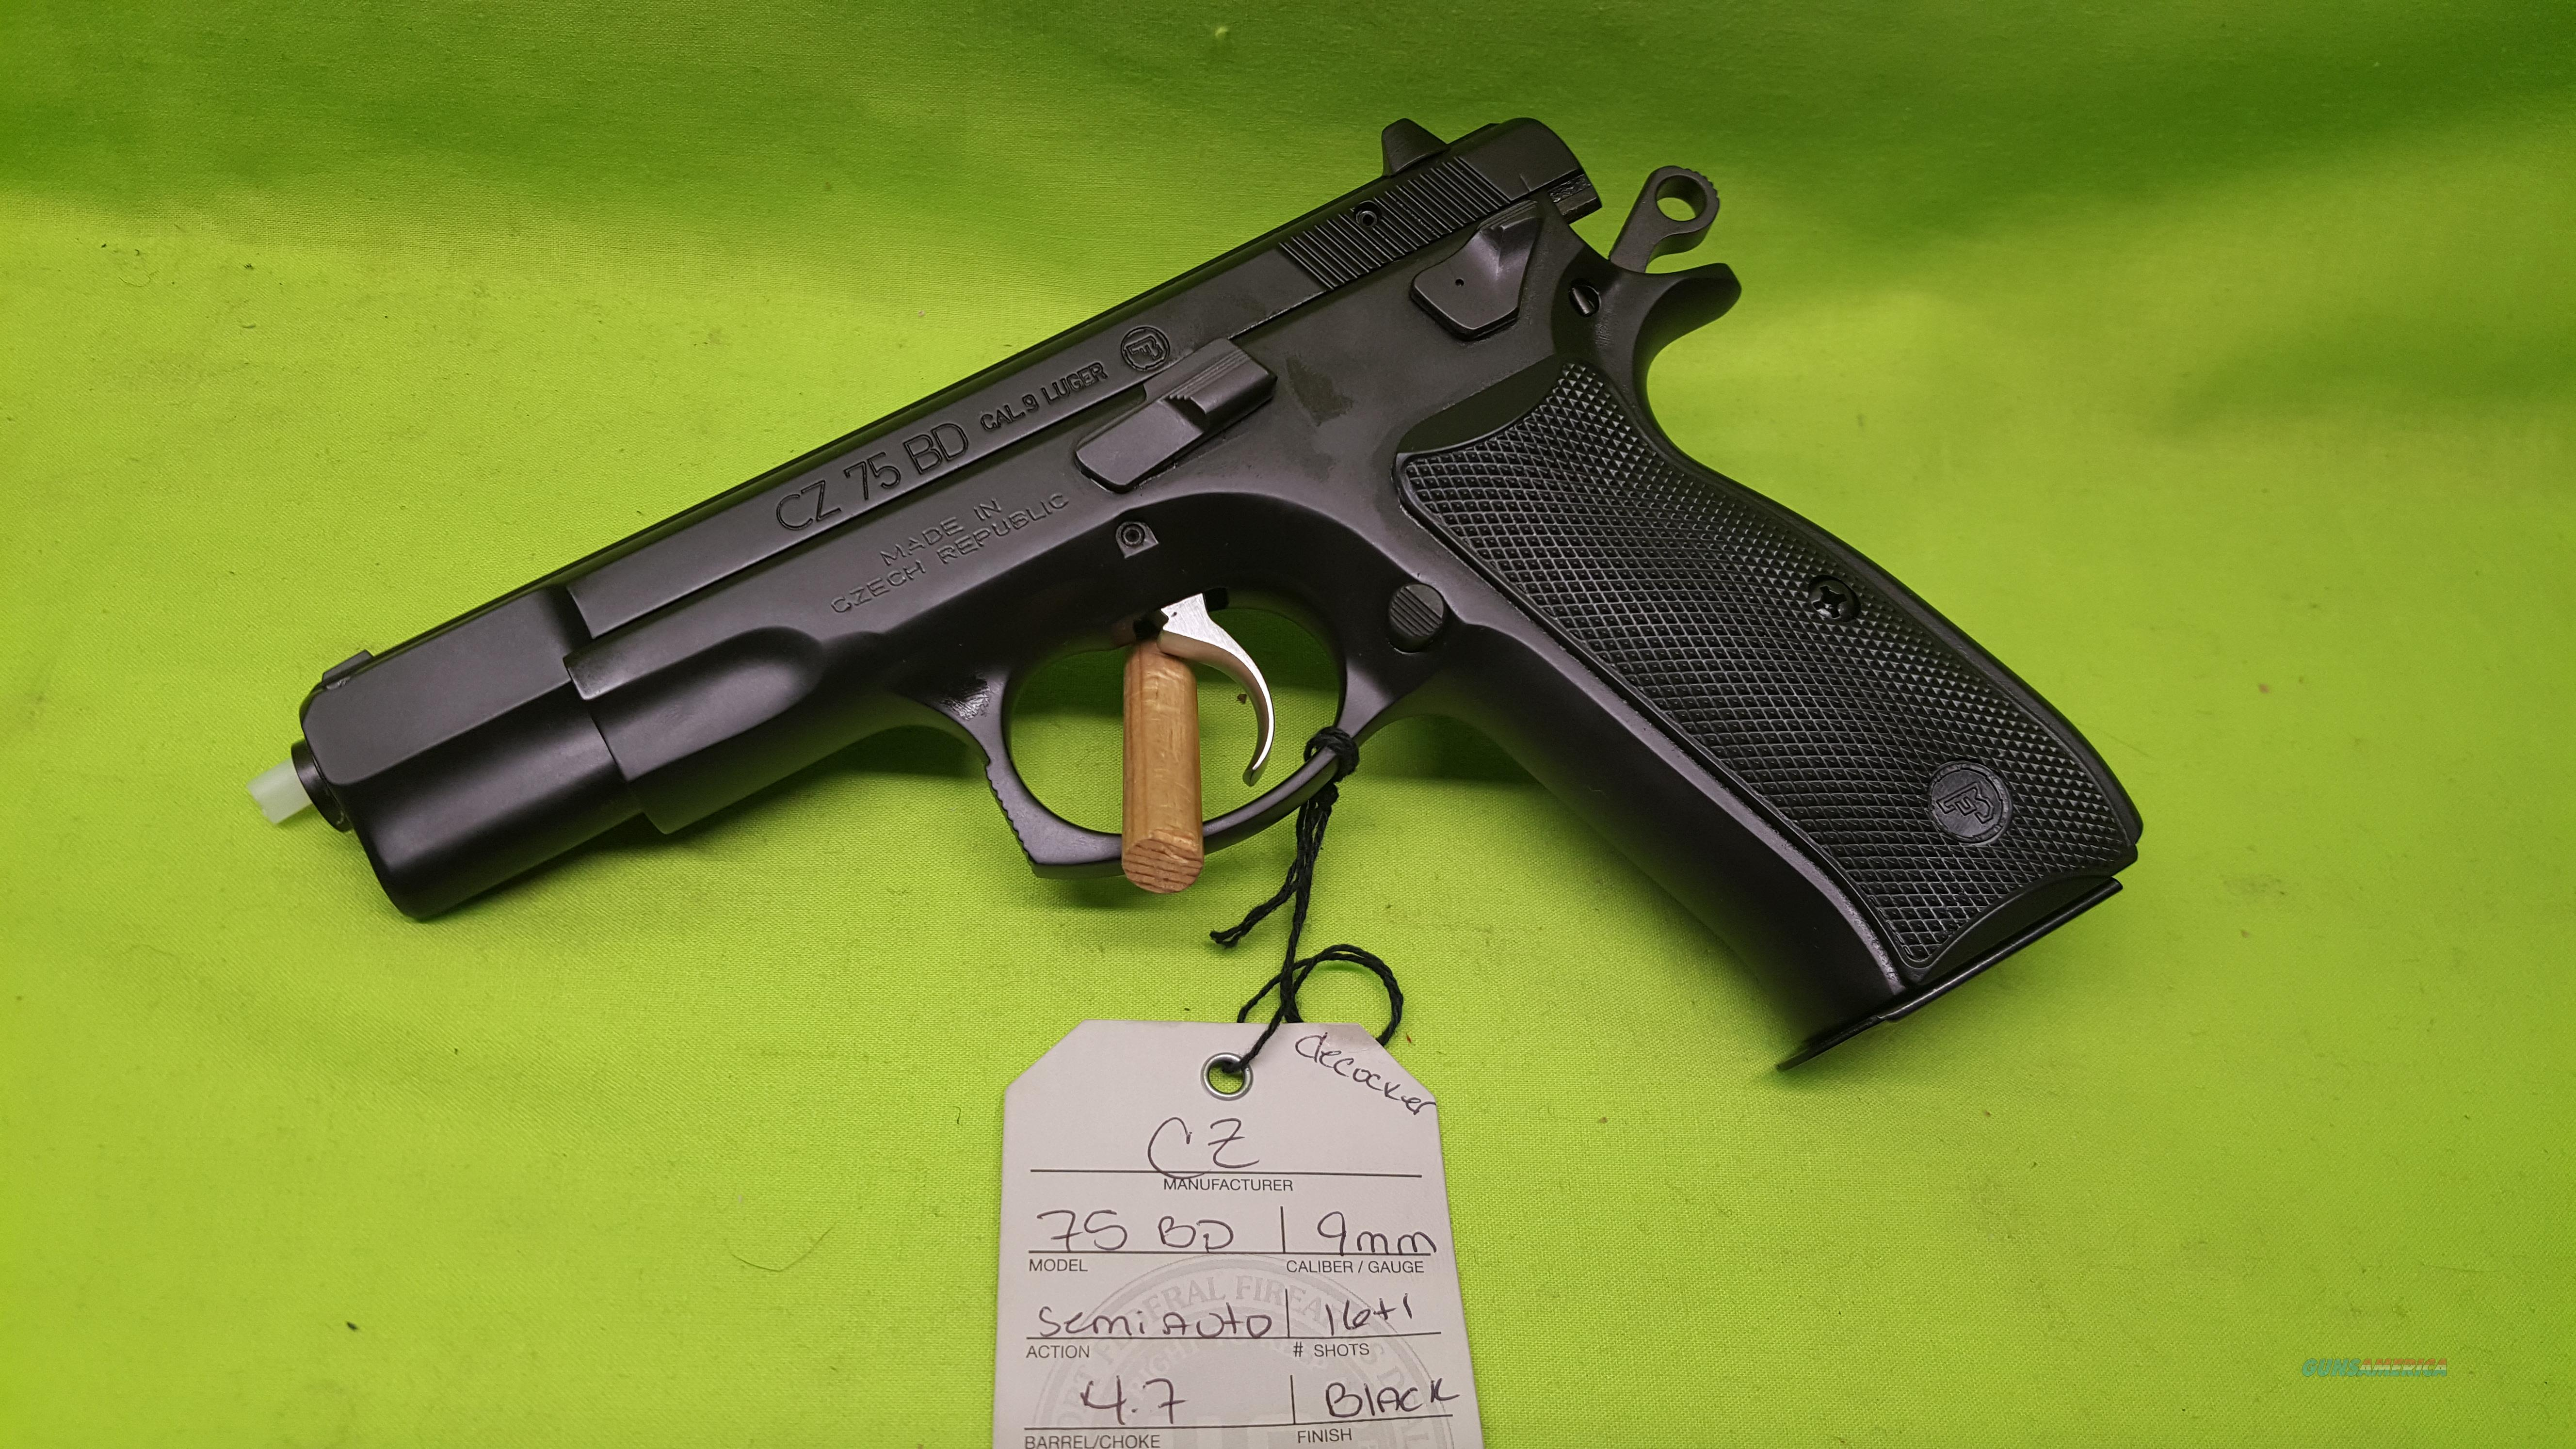 CZ 75 BD 75BD 9MM 9 MM DECOCKER BLACK 2-16RD 91130  Guns > Pistols > CZ Pistols